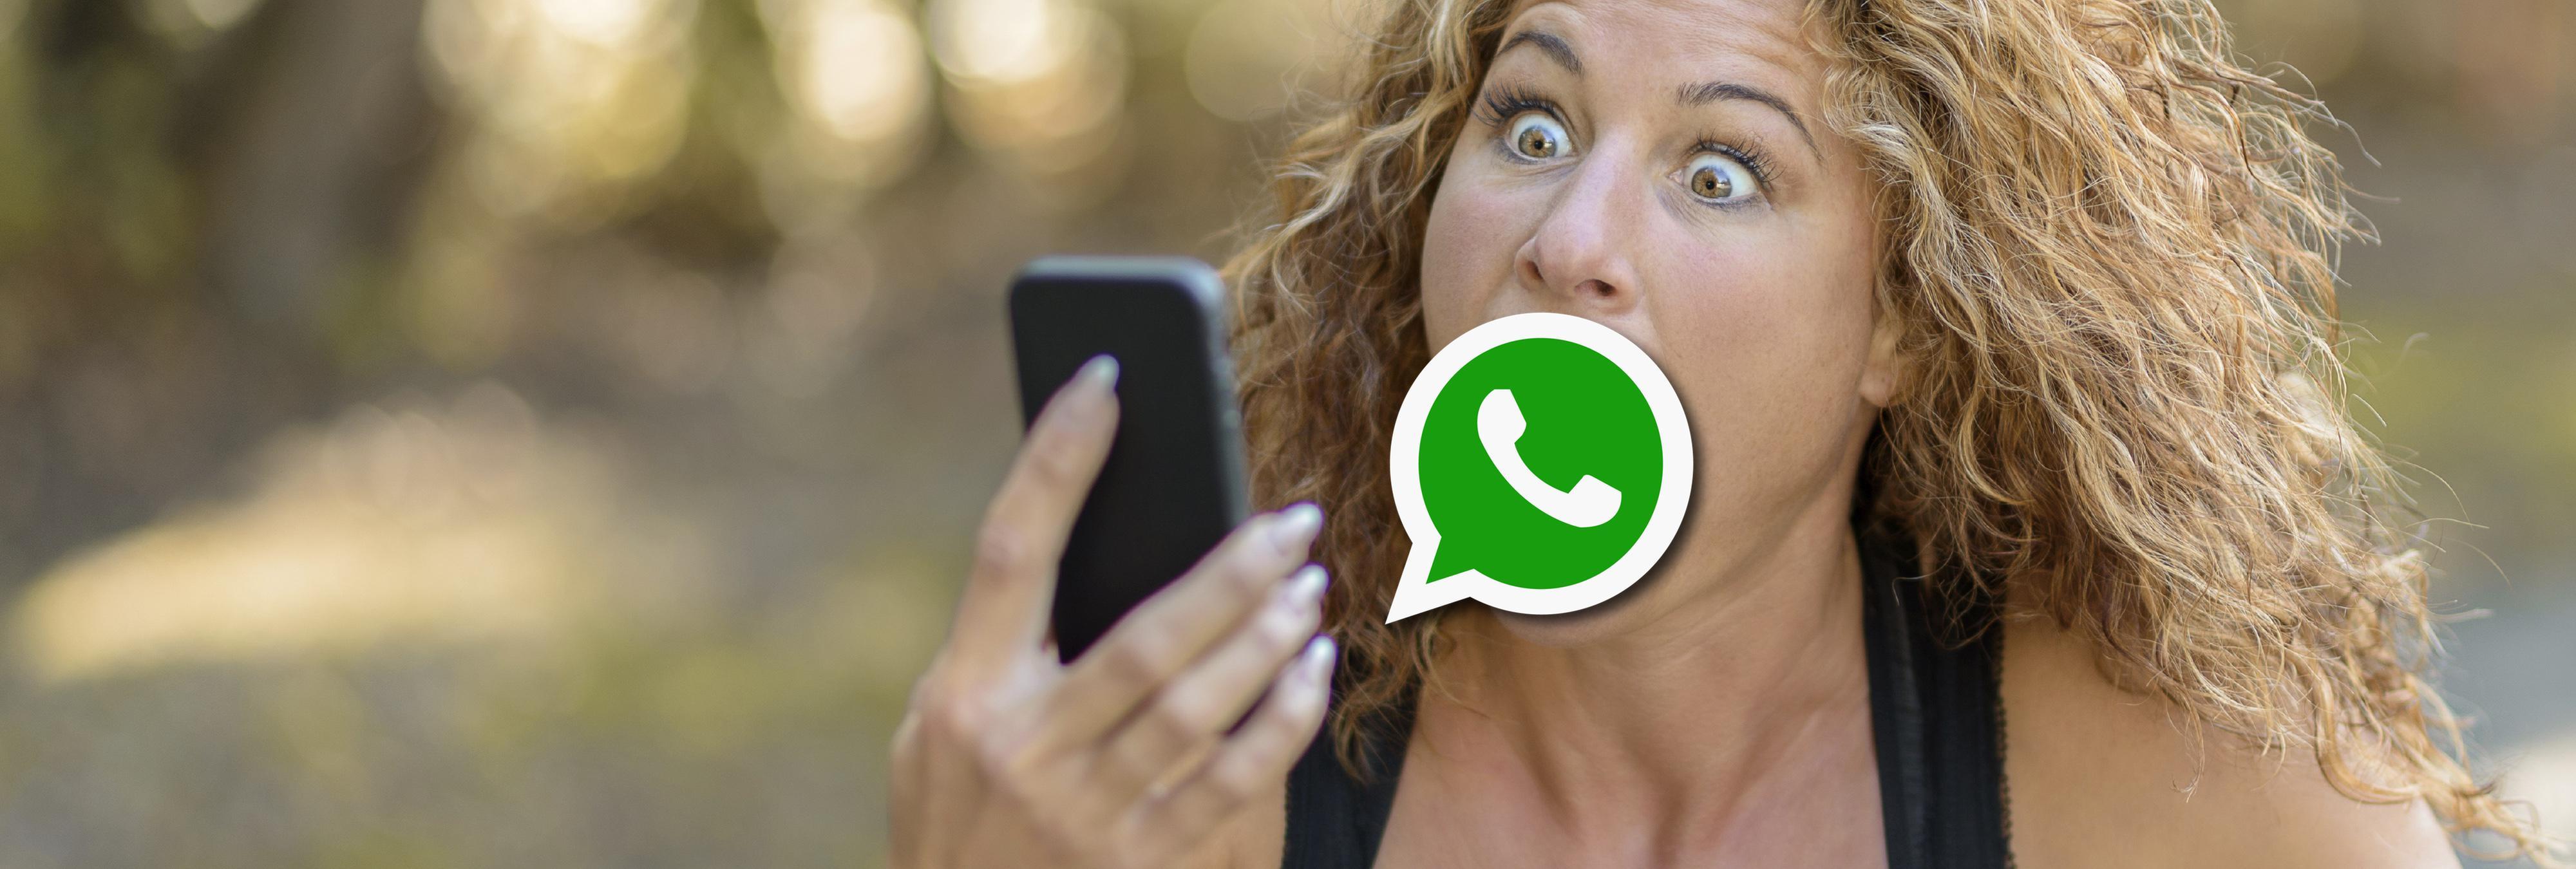 Desde hoy WhatsApp será gratis de por vida